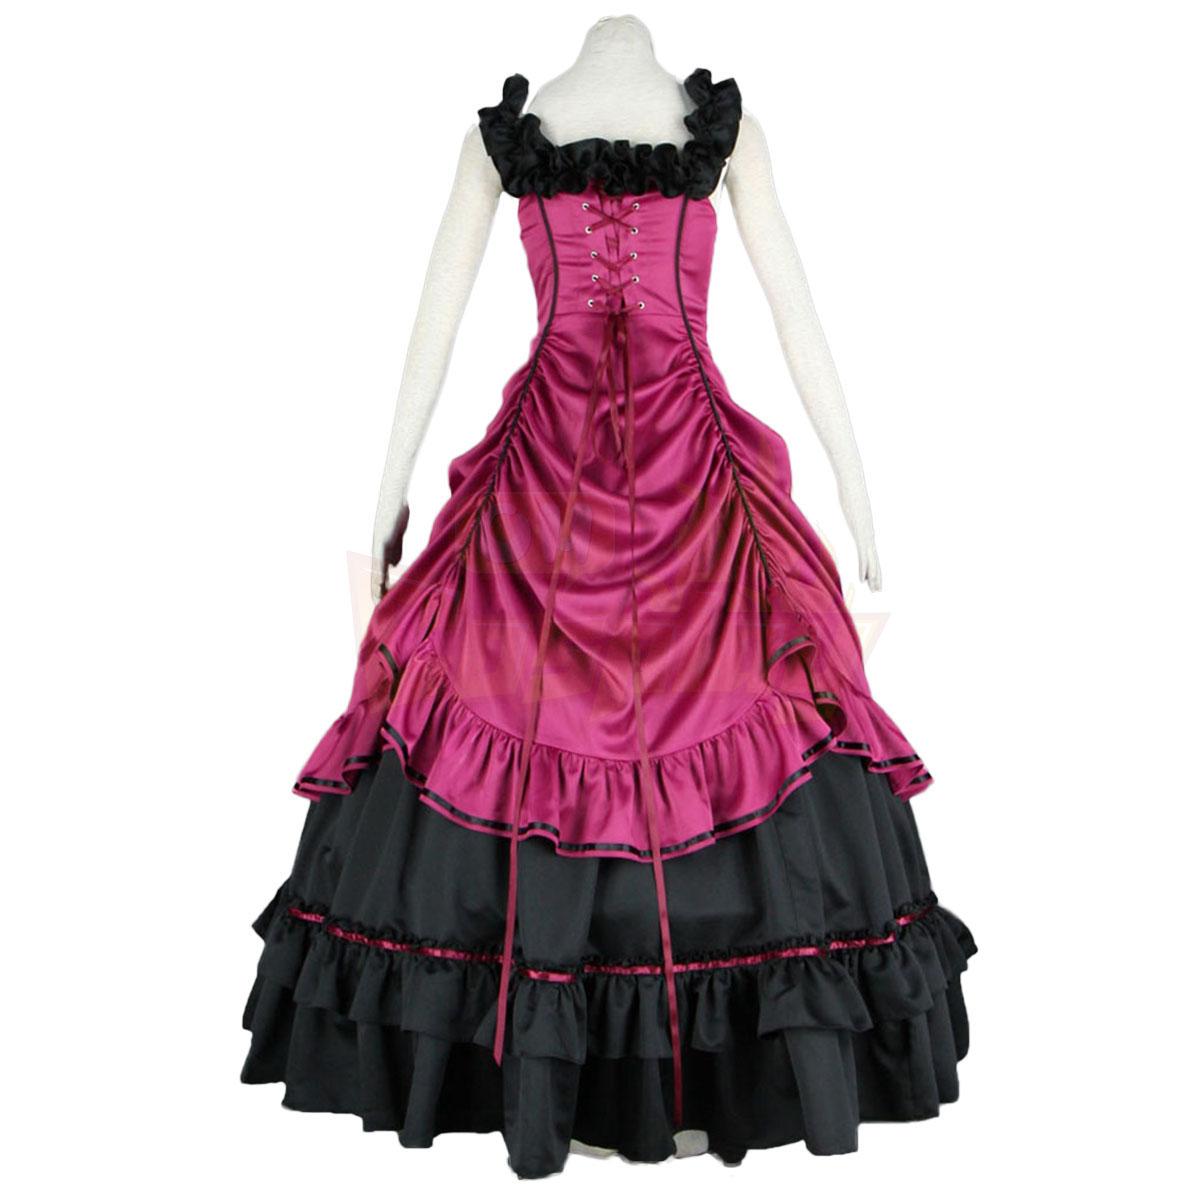 Fantasias Cultura Lolita Sleeveless Bustle Vestidos Longos Trajes Cosplay